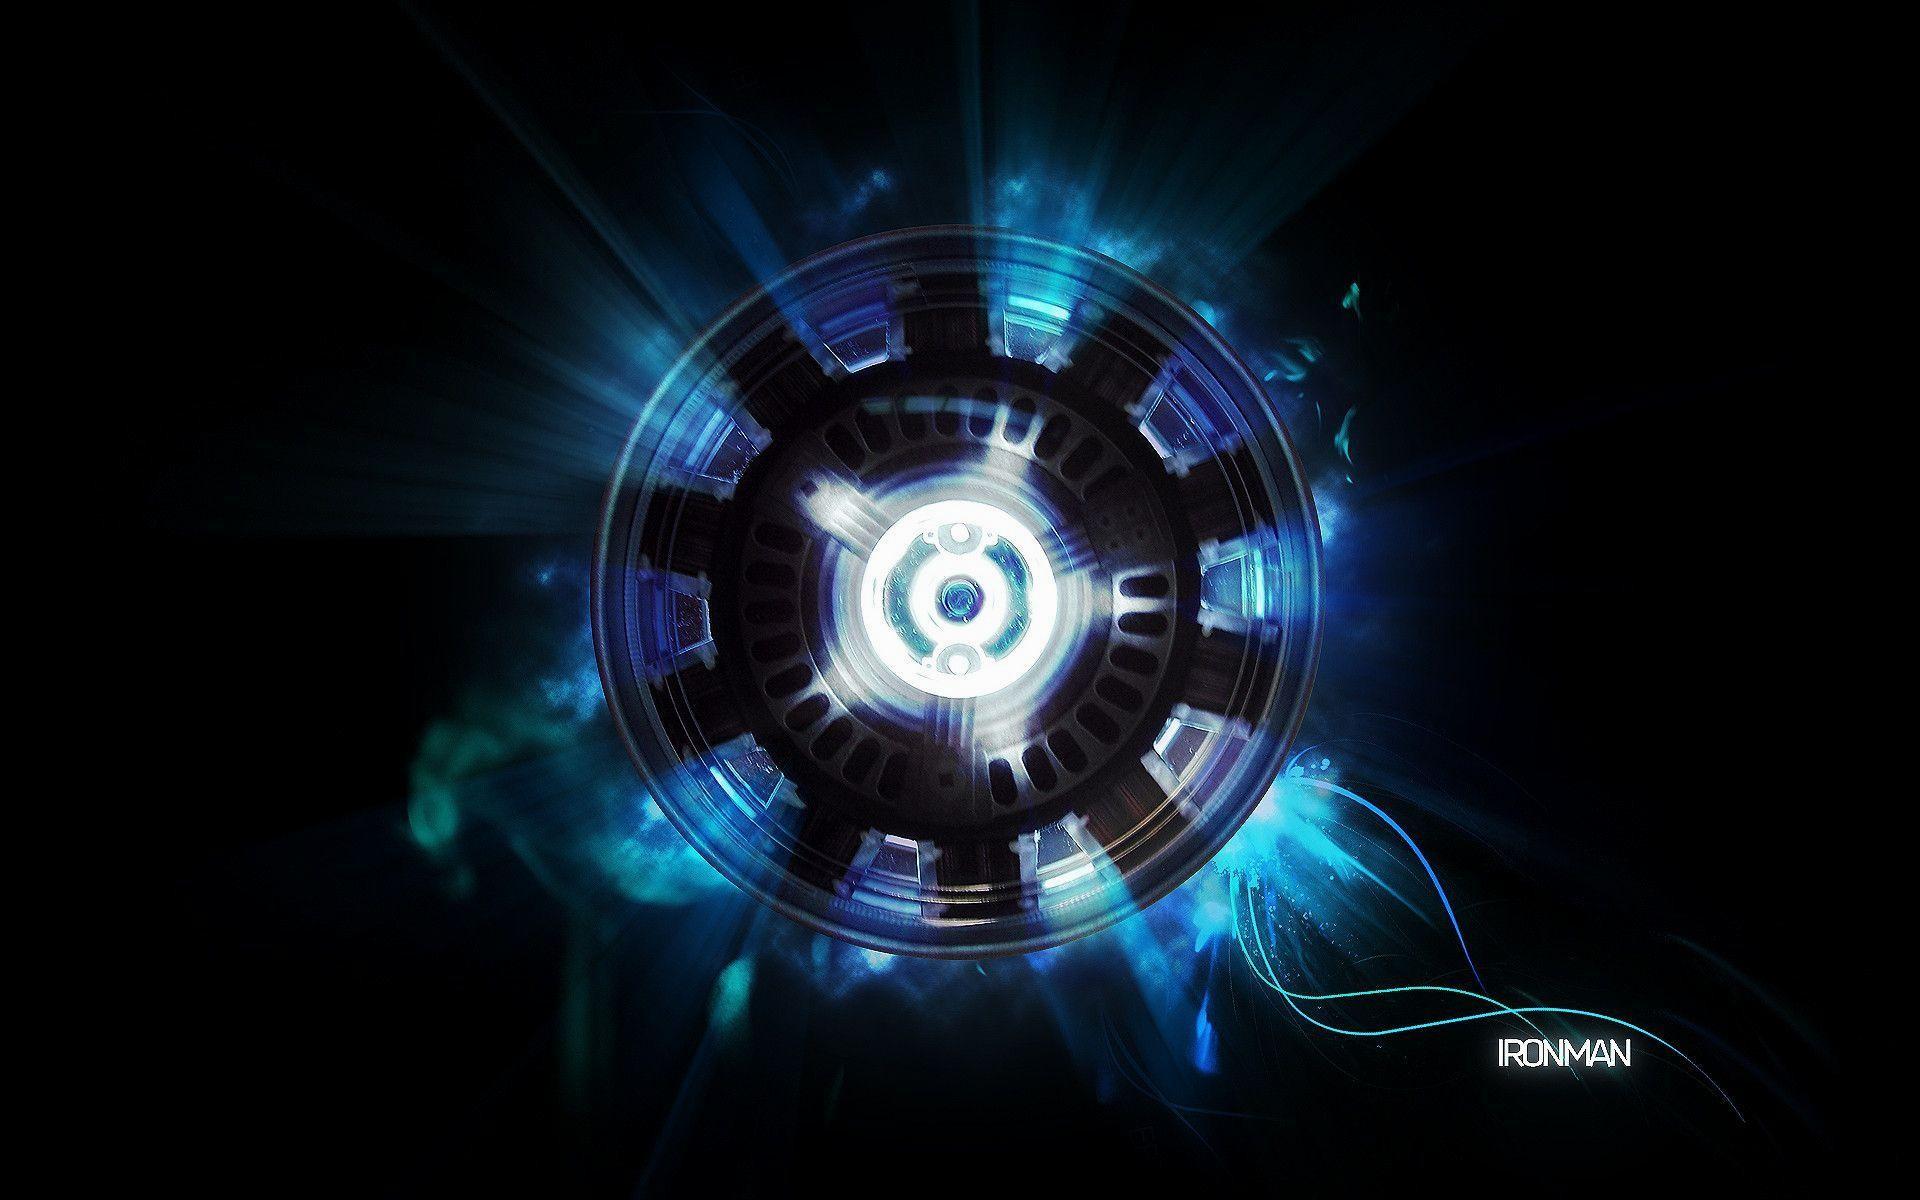 wallpaper.wiki-Cool-Arc-Reactor-Iron-Man-1920×1200-